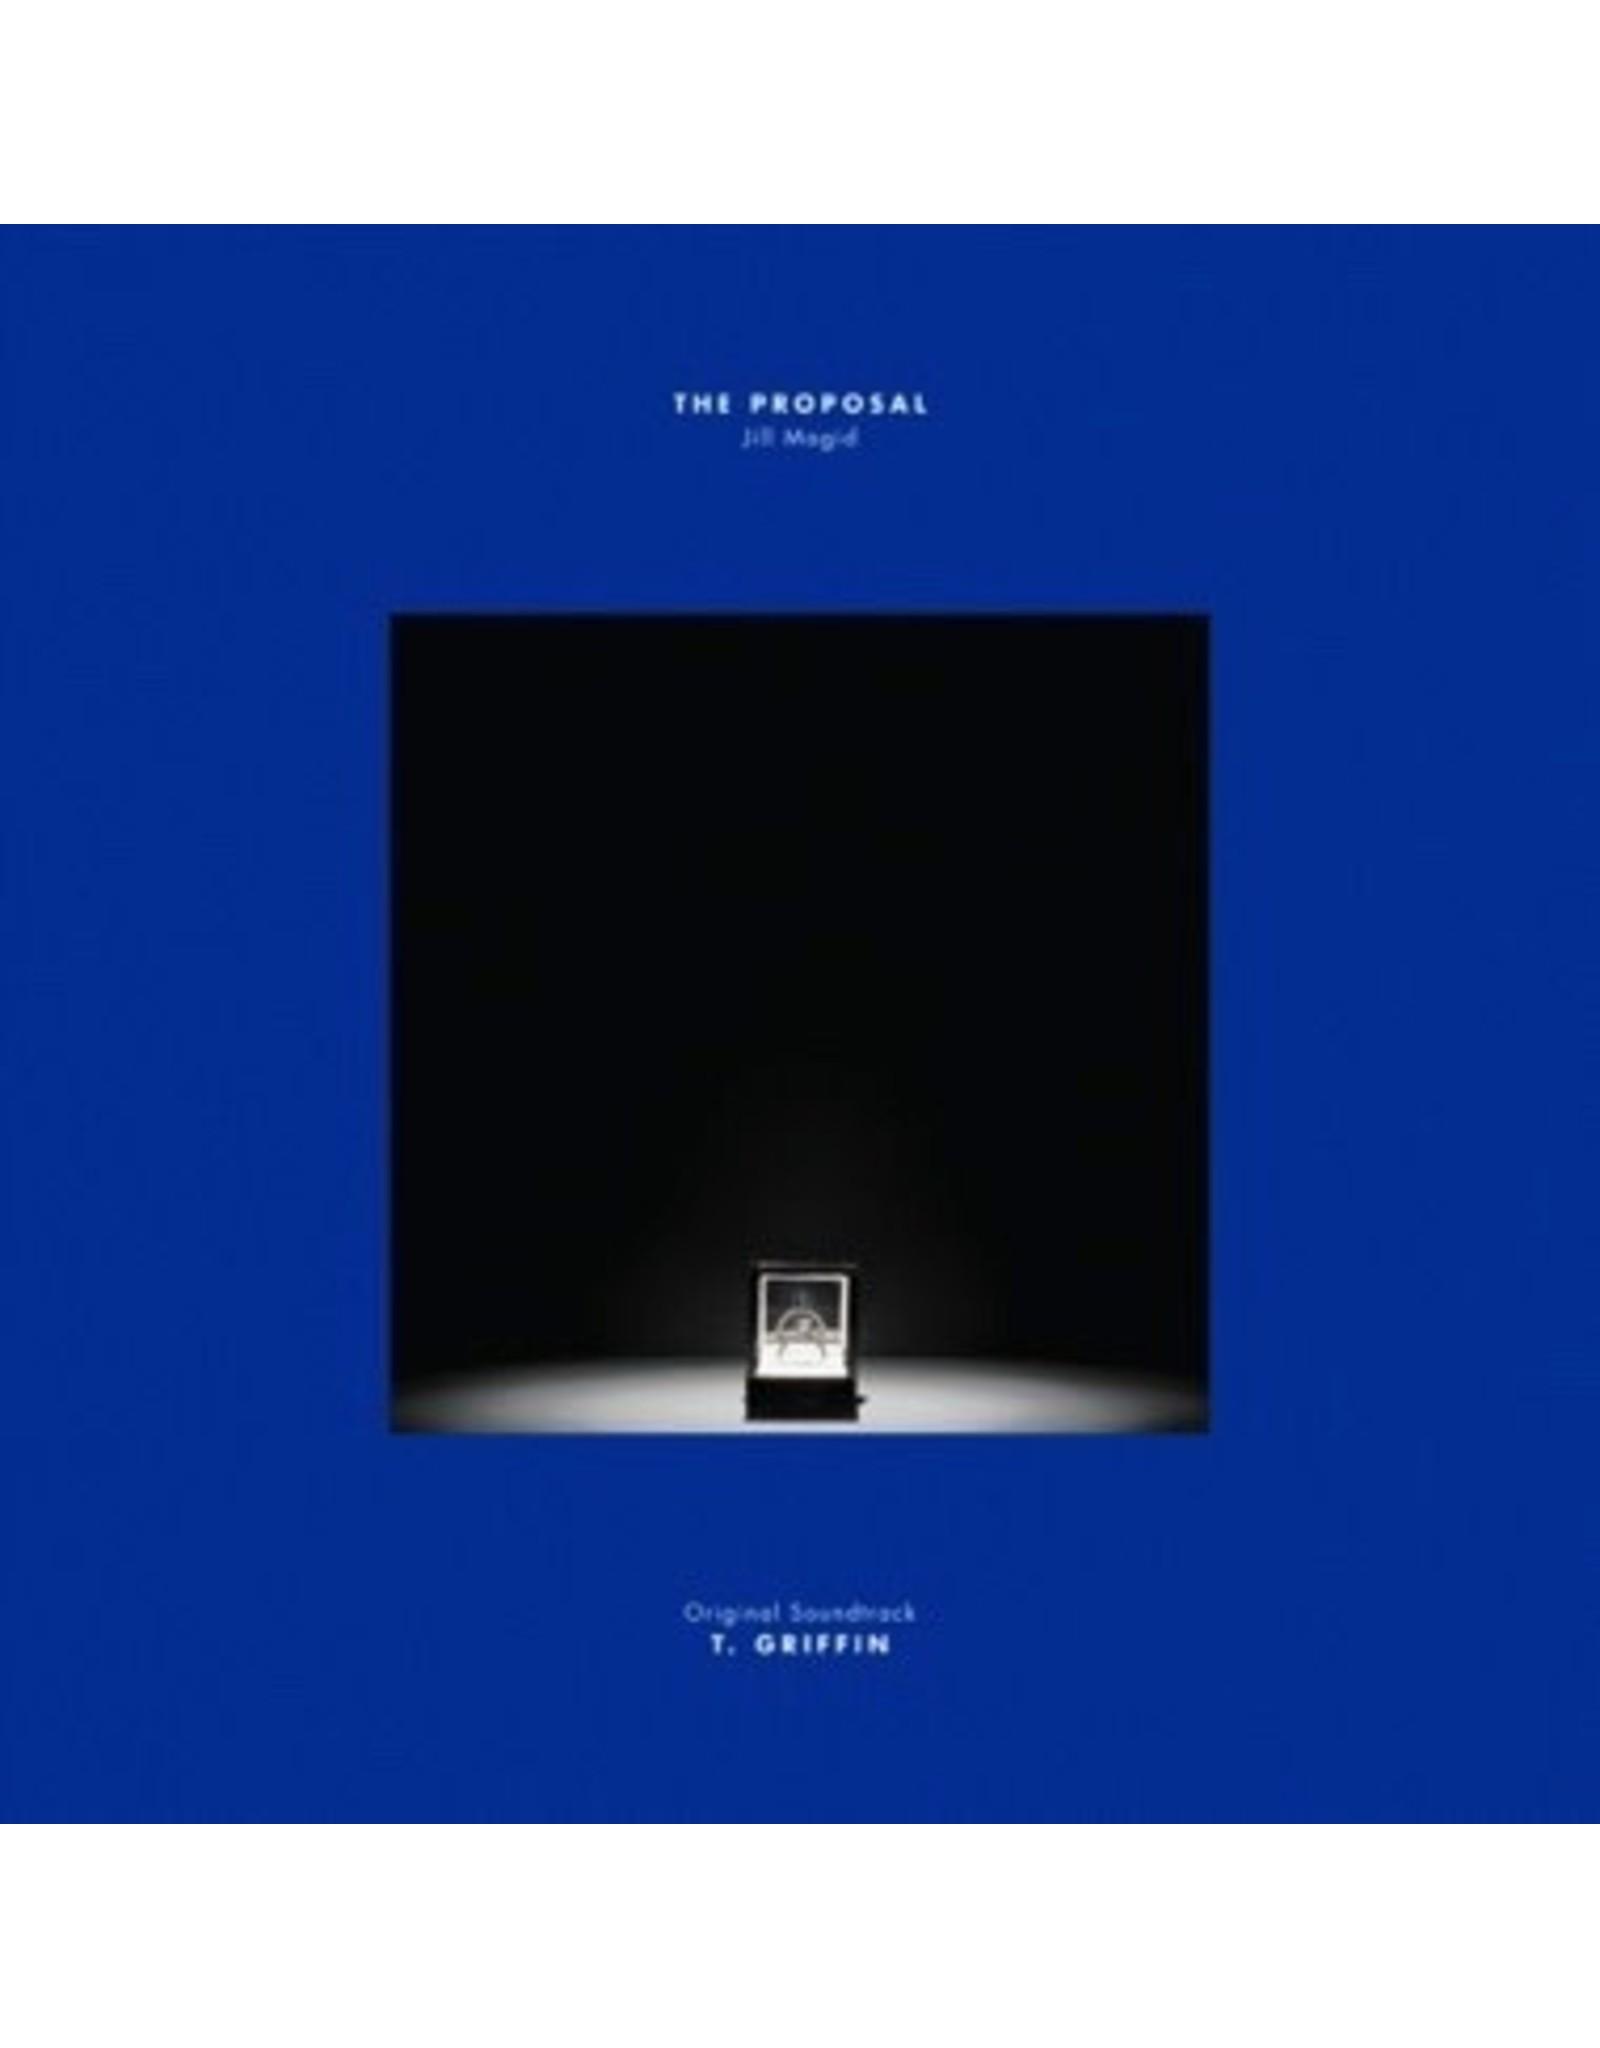 New Vinyl T. Griffin - The Proposal OST LP